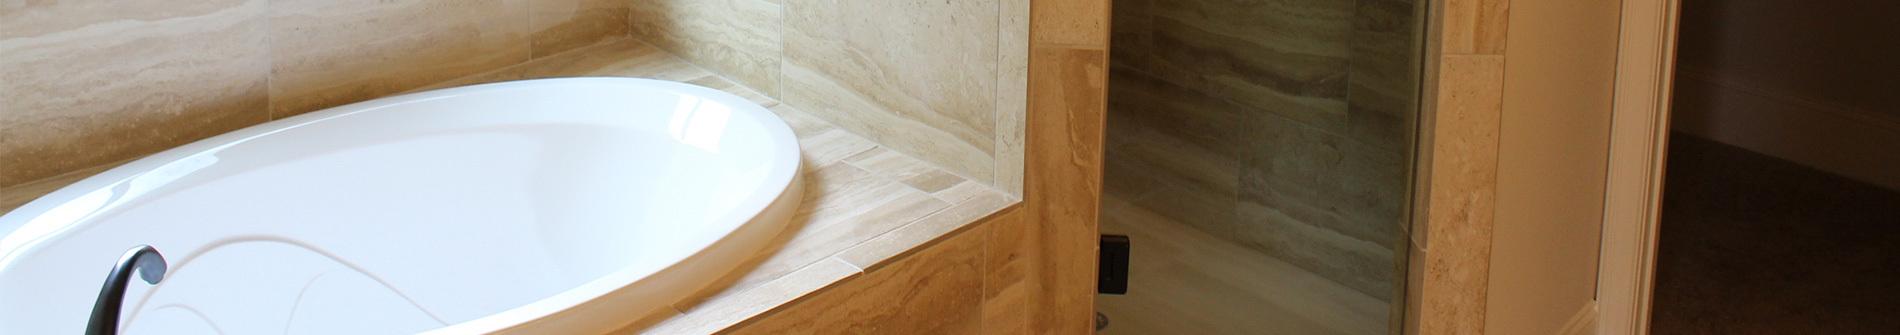 ep-divider-master-bath